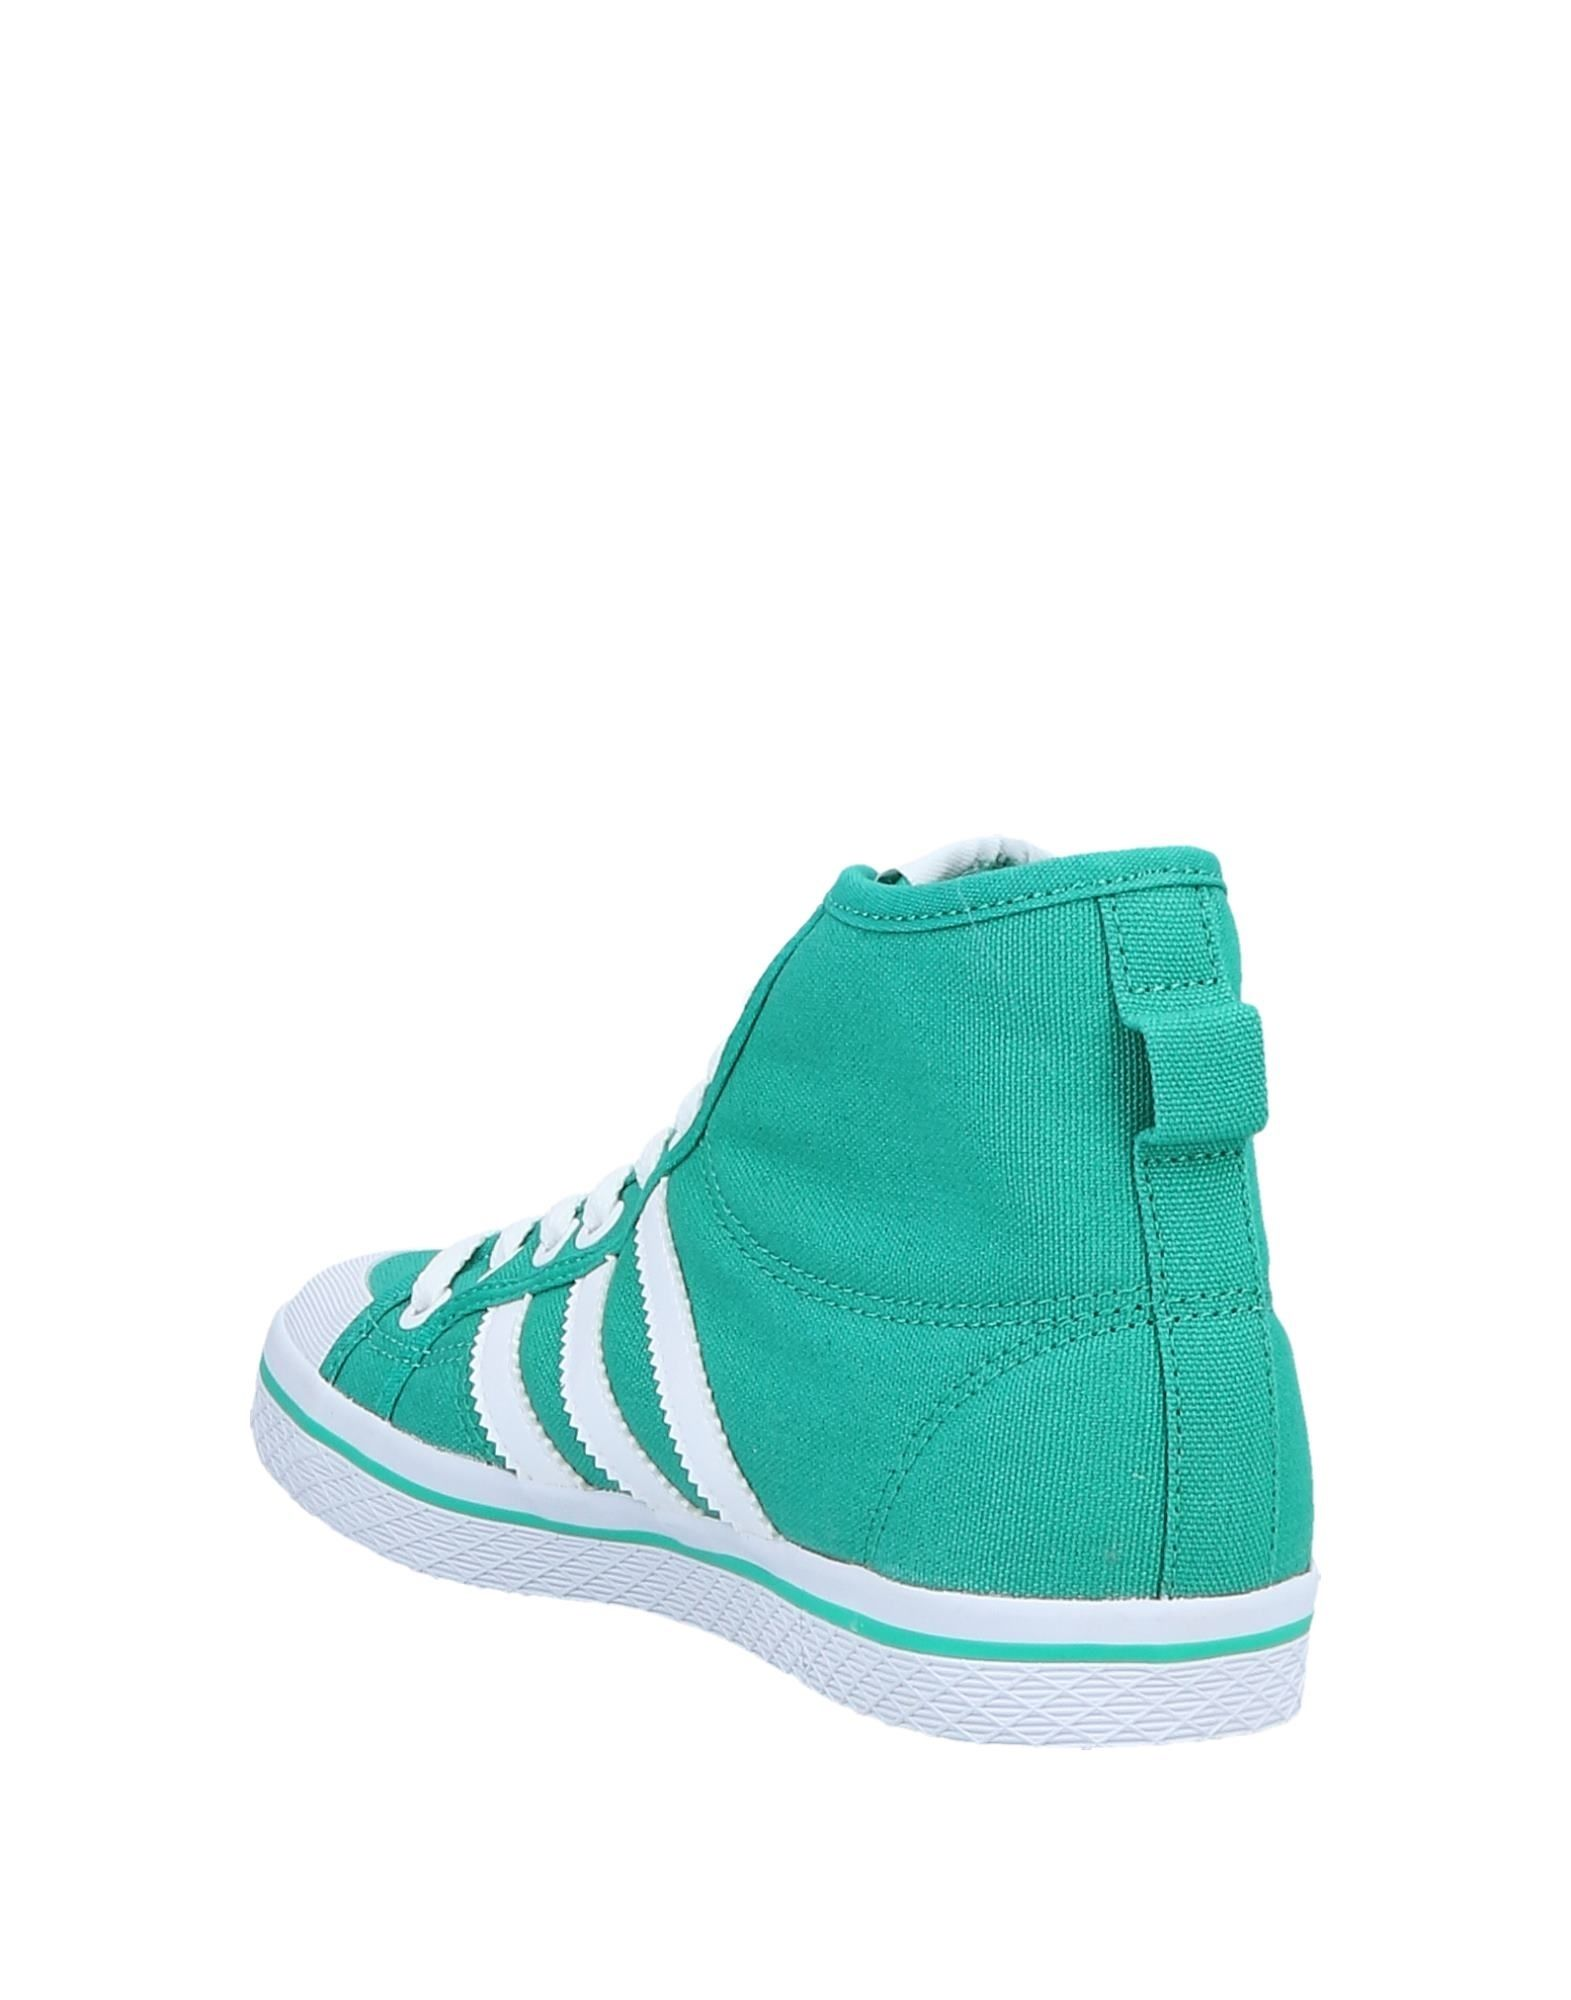 adidas originaux baskets - femmes adidas originaux originaux originaux des baskets en ligne sur canada 8ebea2